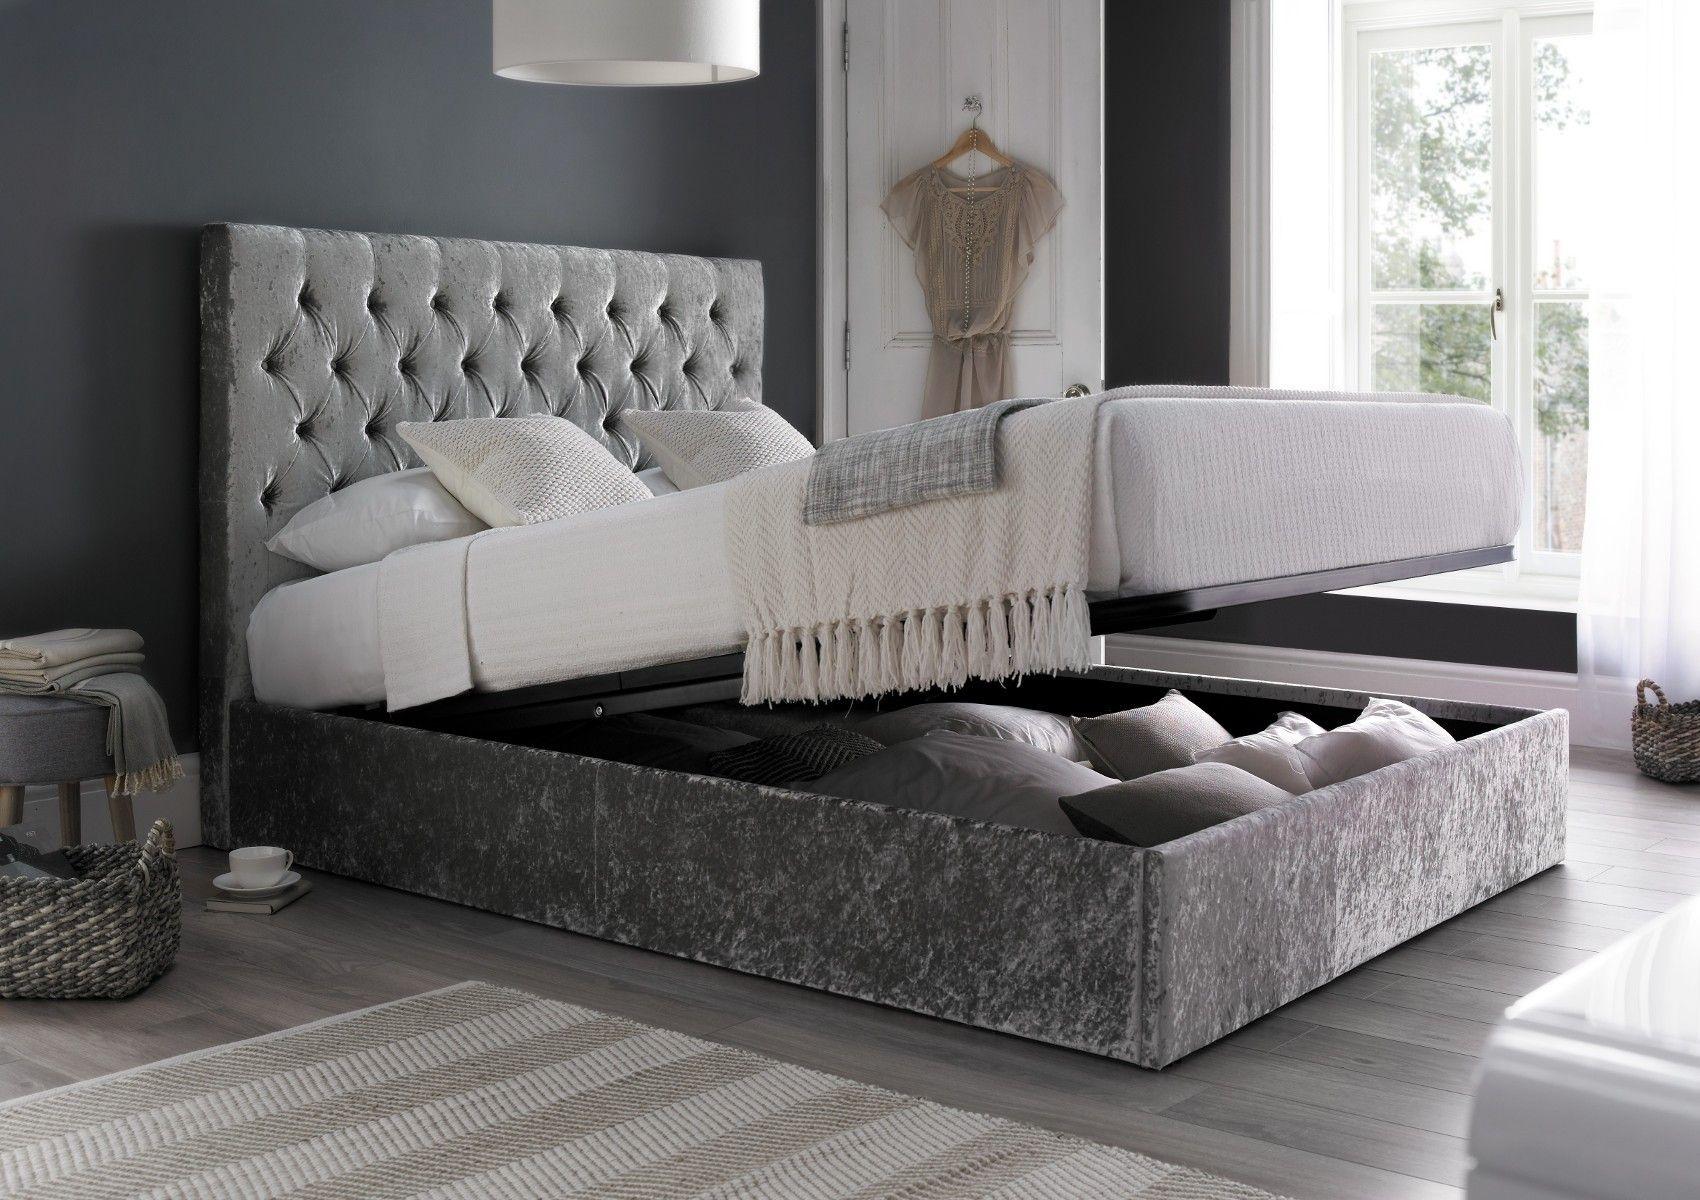 Sapphire Upholstered Ottoman Storage Bed - Glitz Silver - Ottoman ...